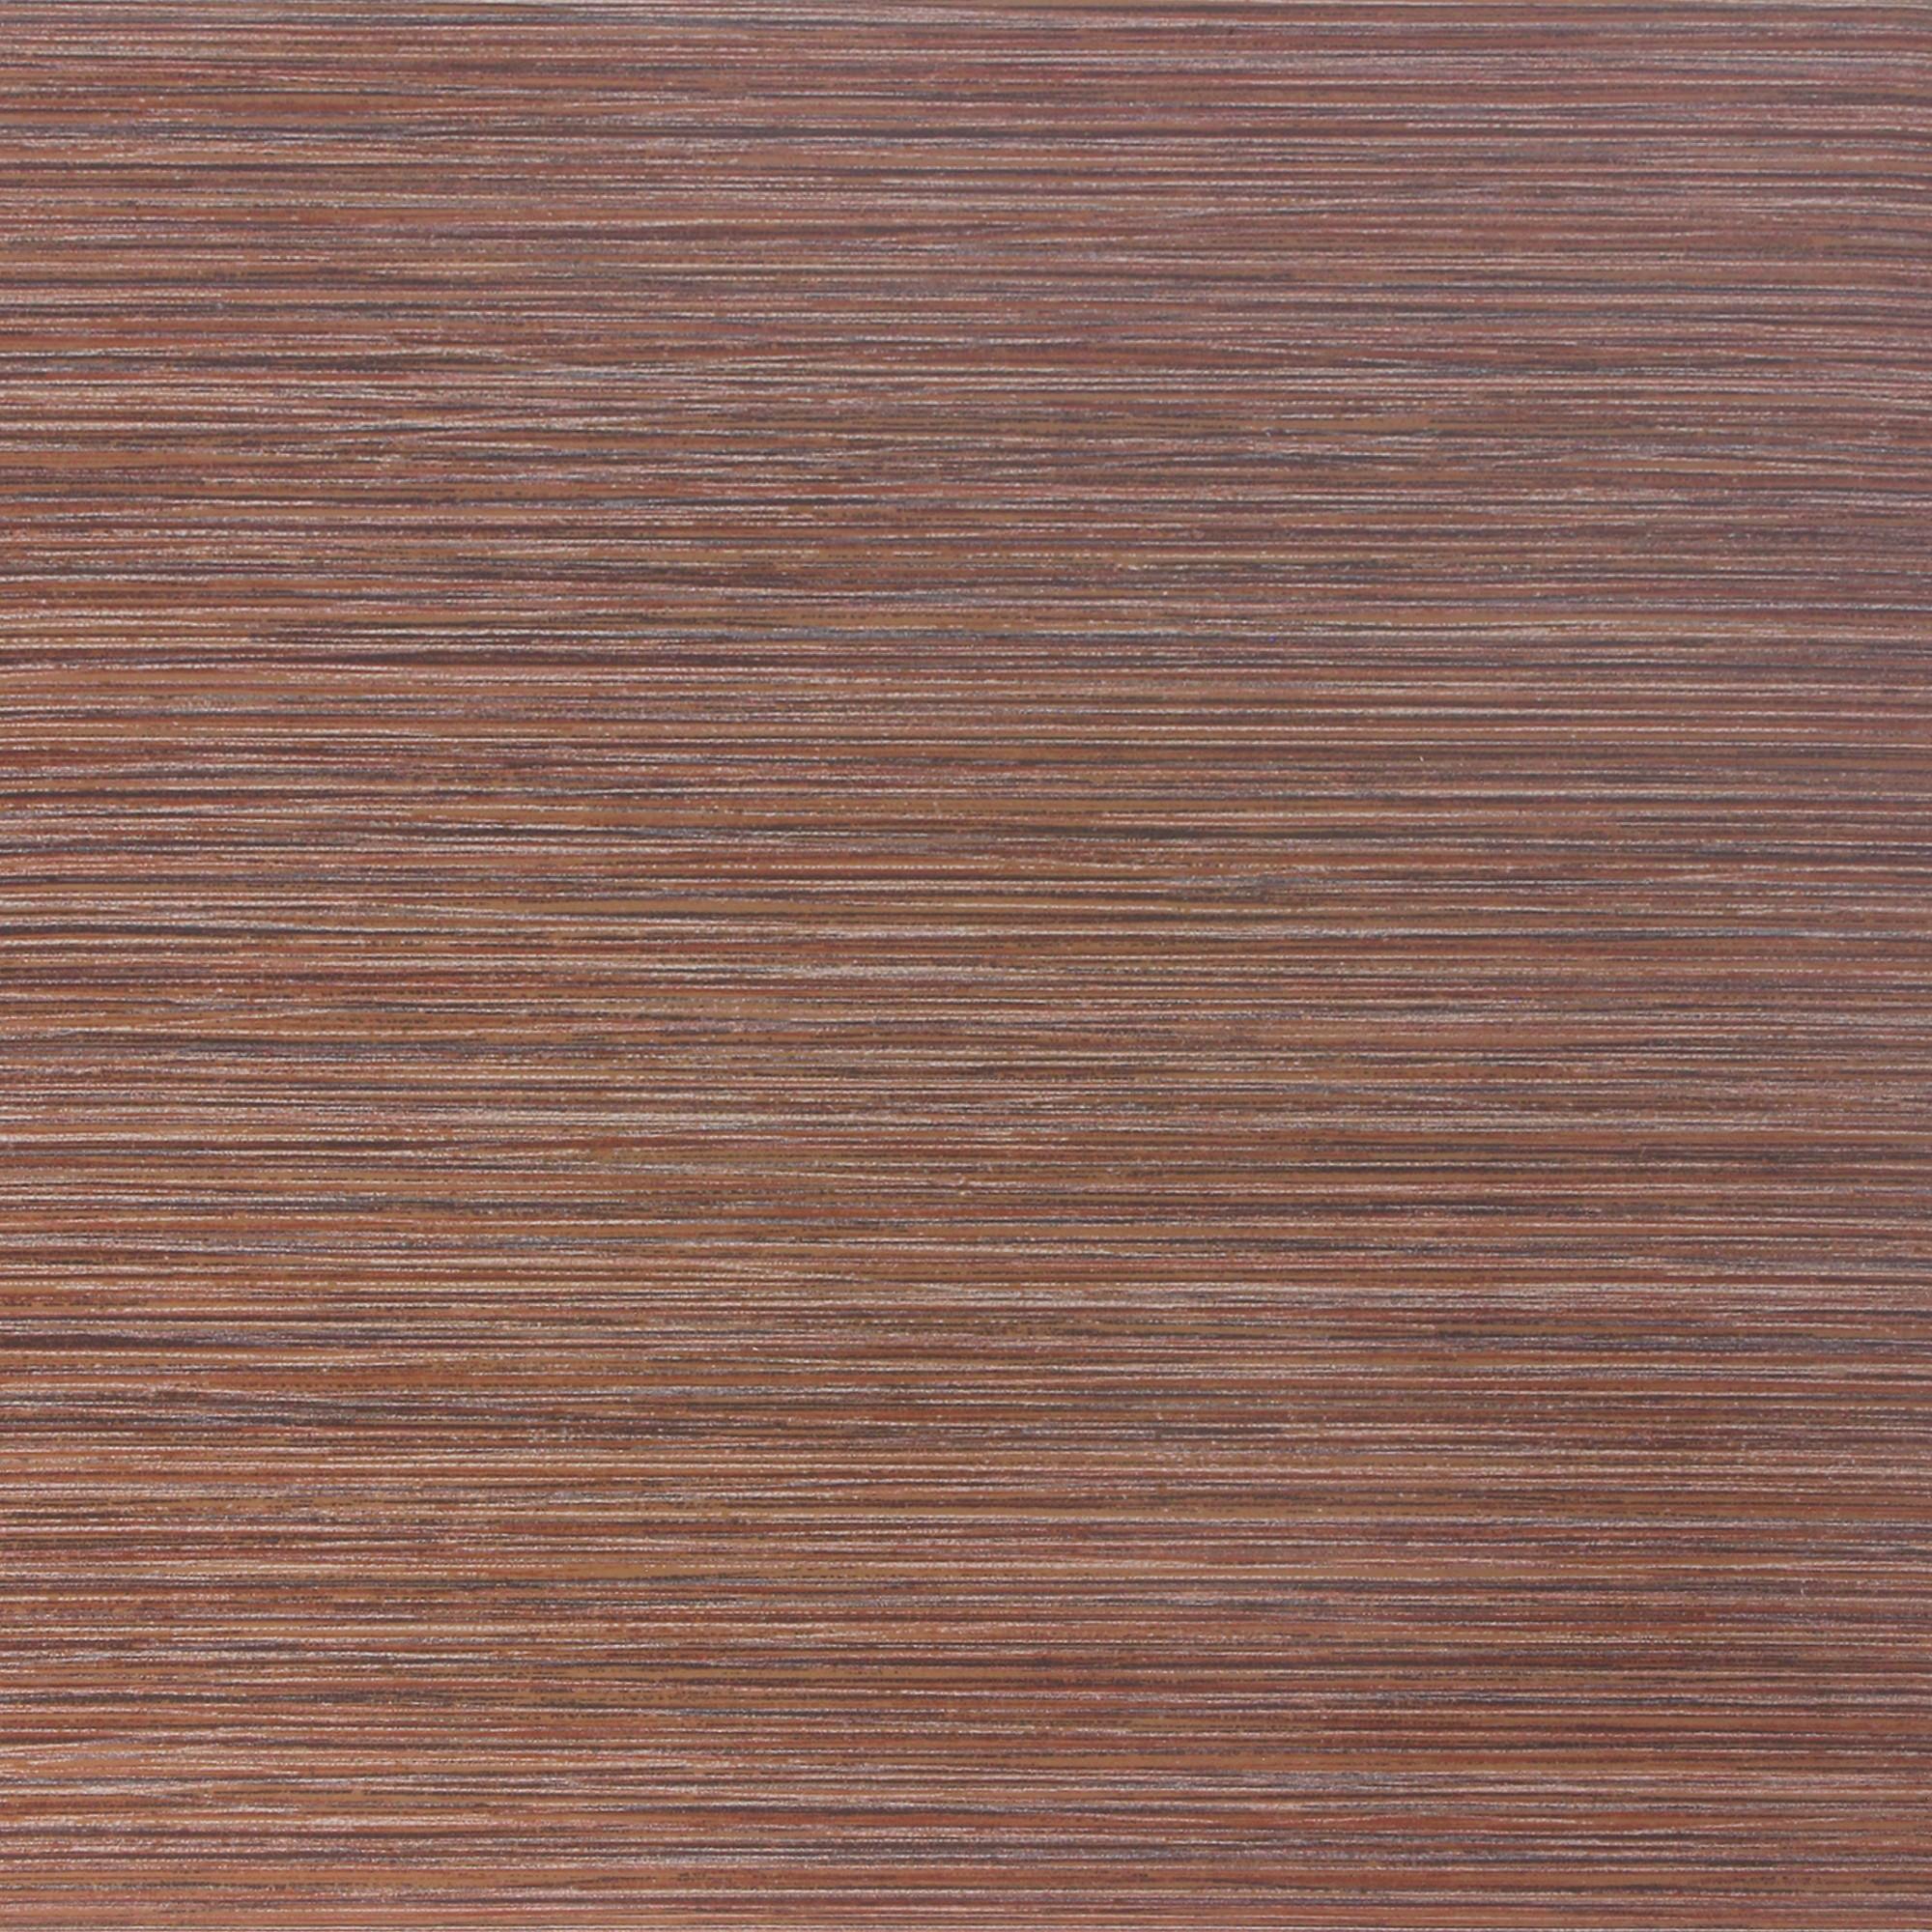 Wandtegel Bale Bruin Glanzend 33×33 cm